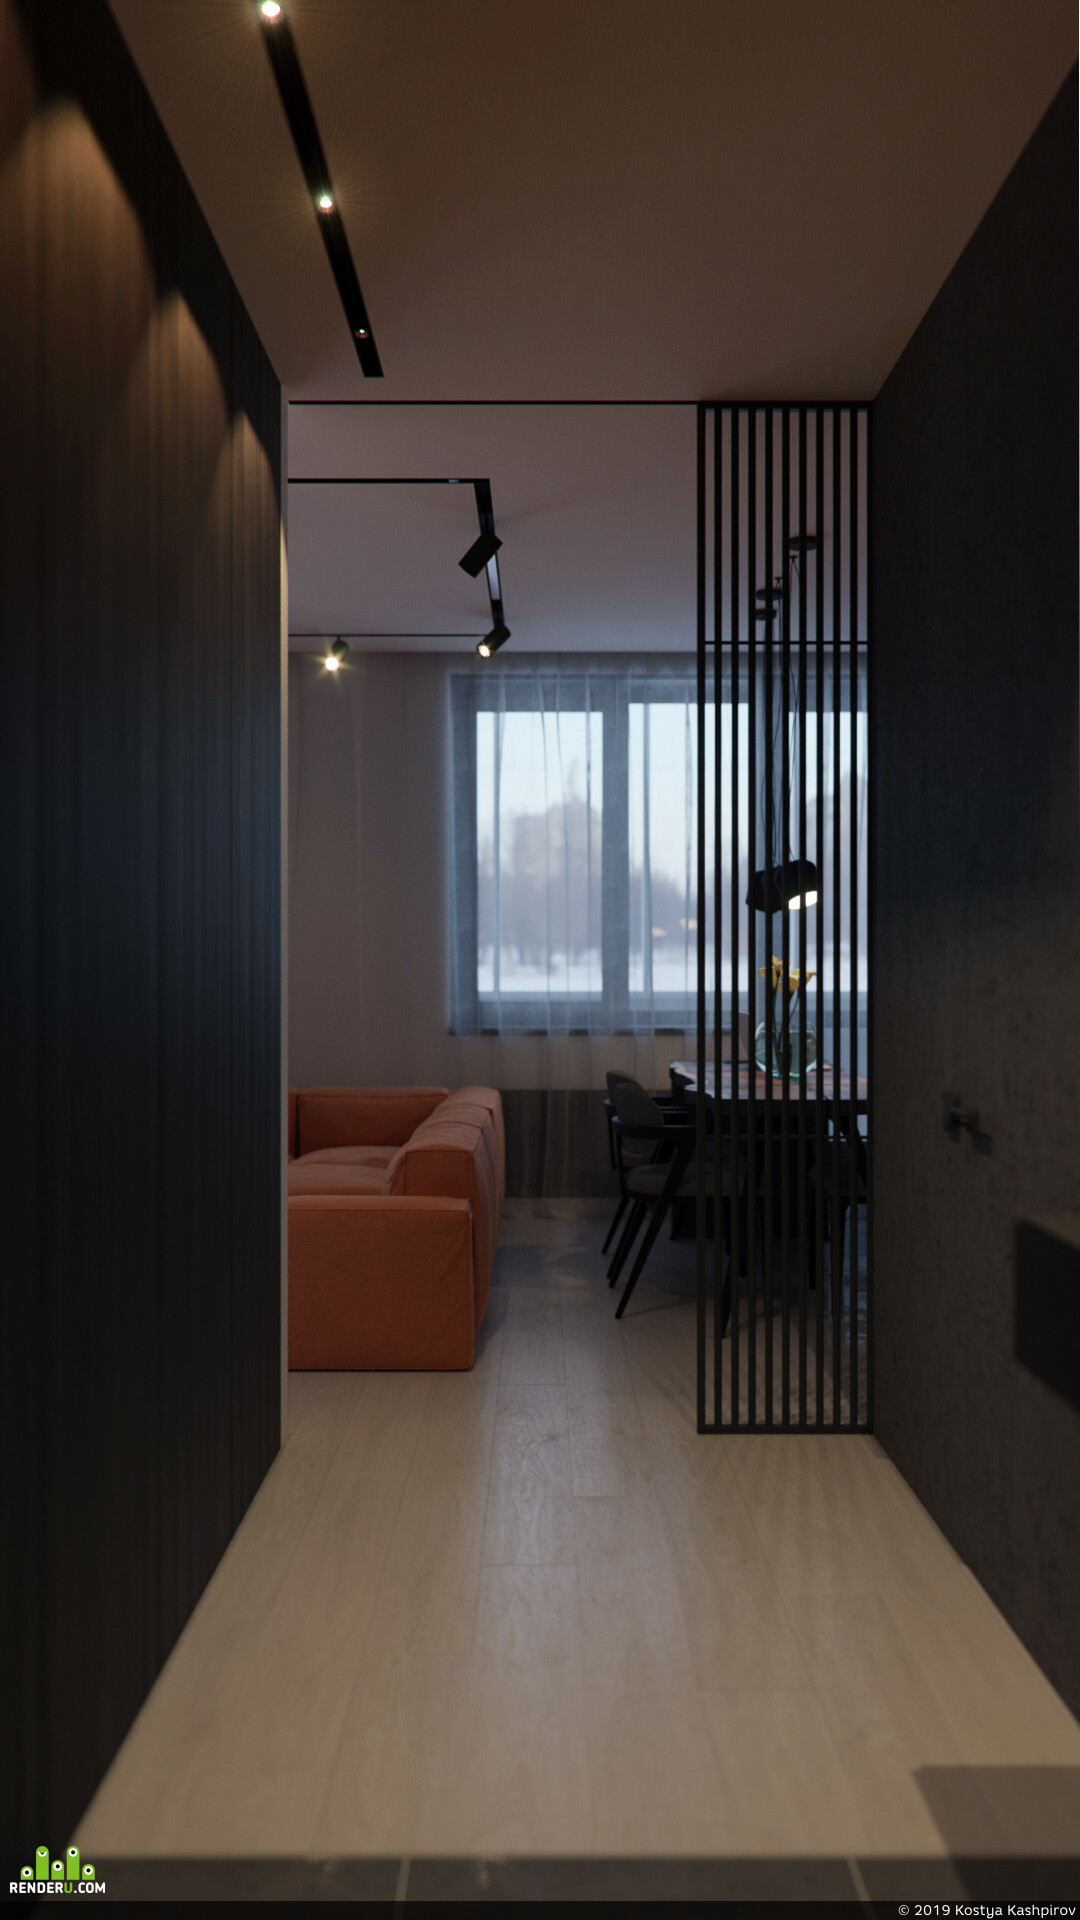 interior interior design design 3D 3D Studio Max 3D архитектура интерьер дизайн интерьера интерьер, visualization, дизайн интерьера